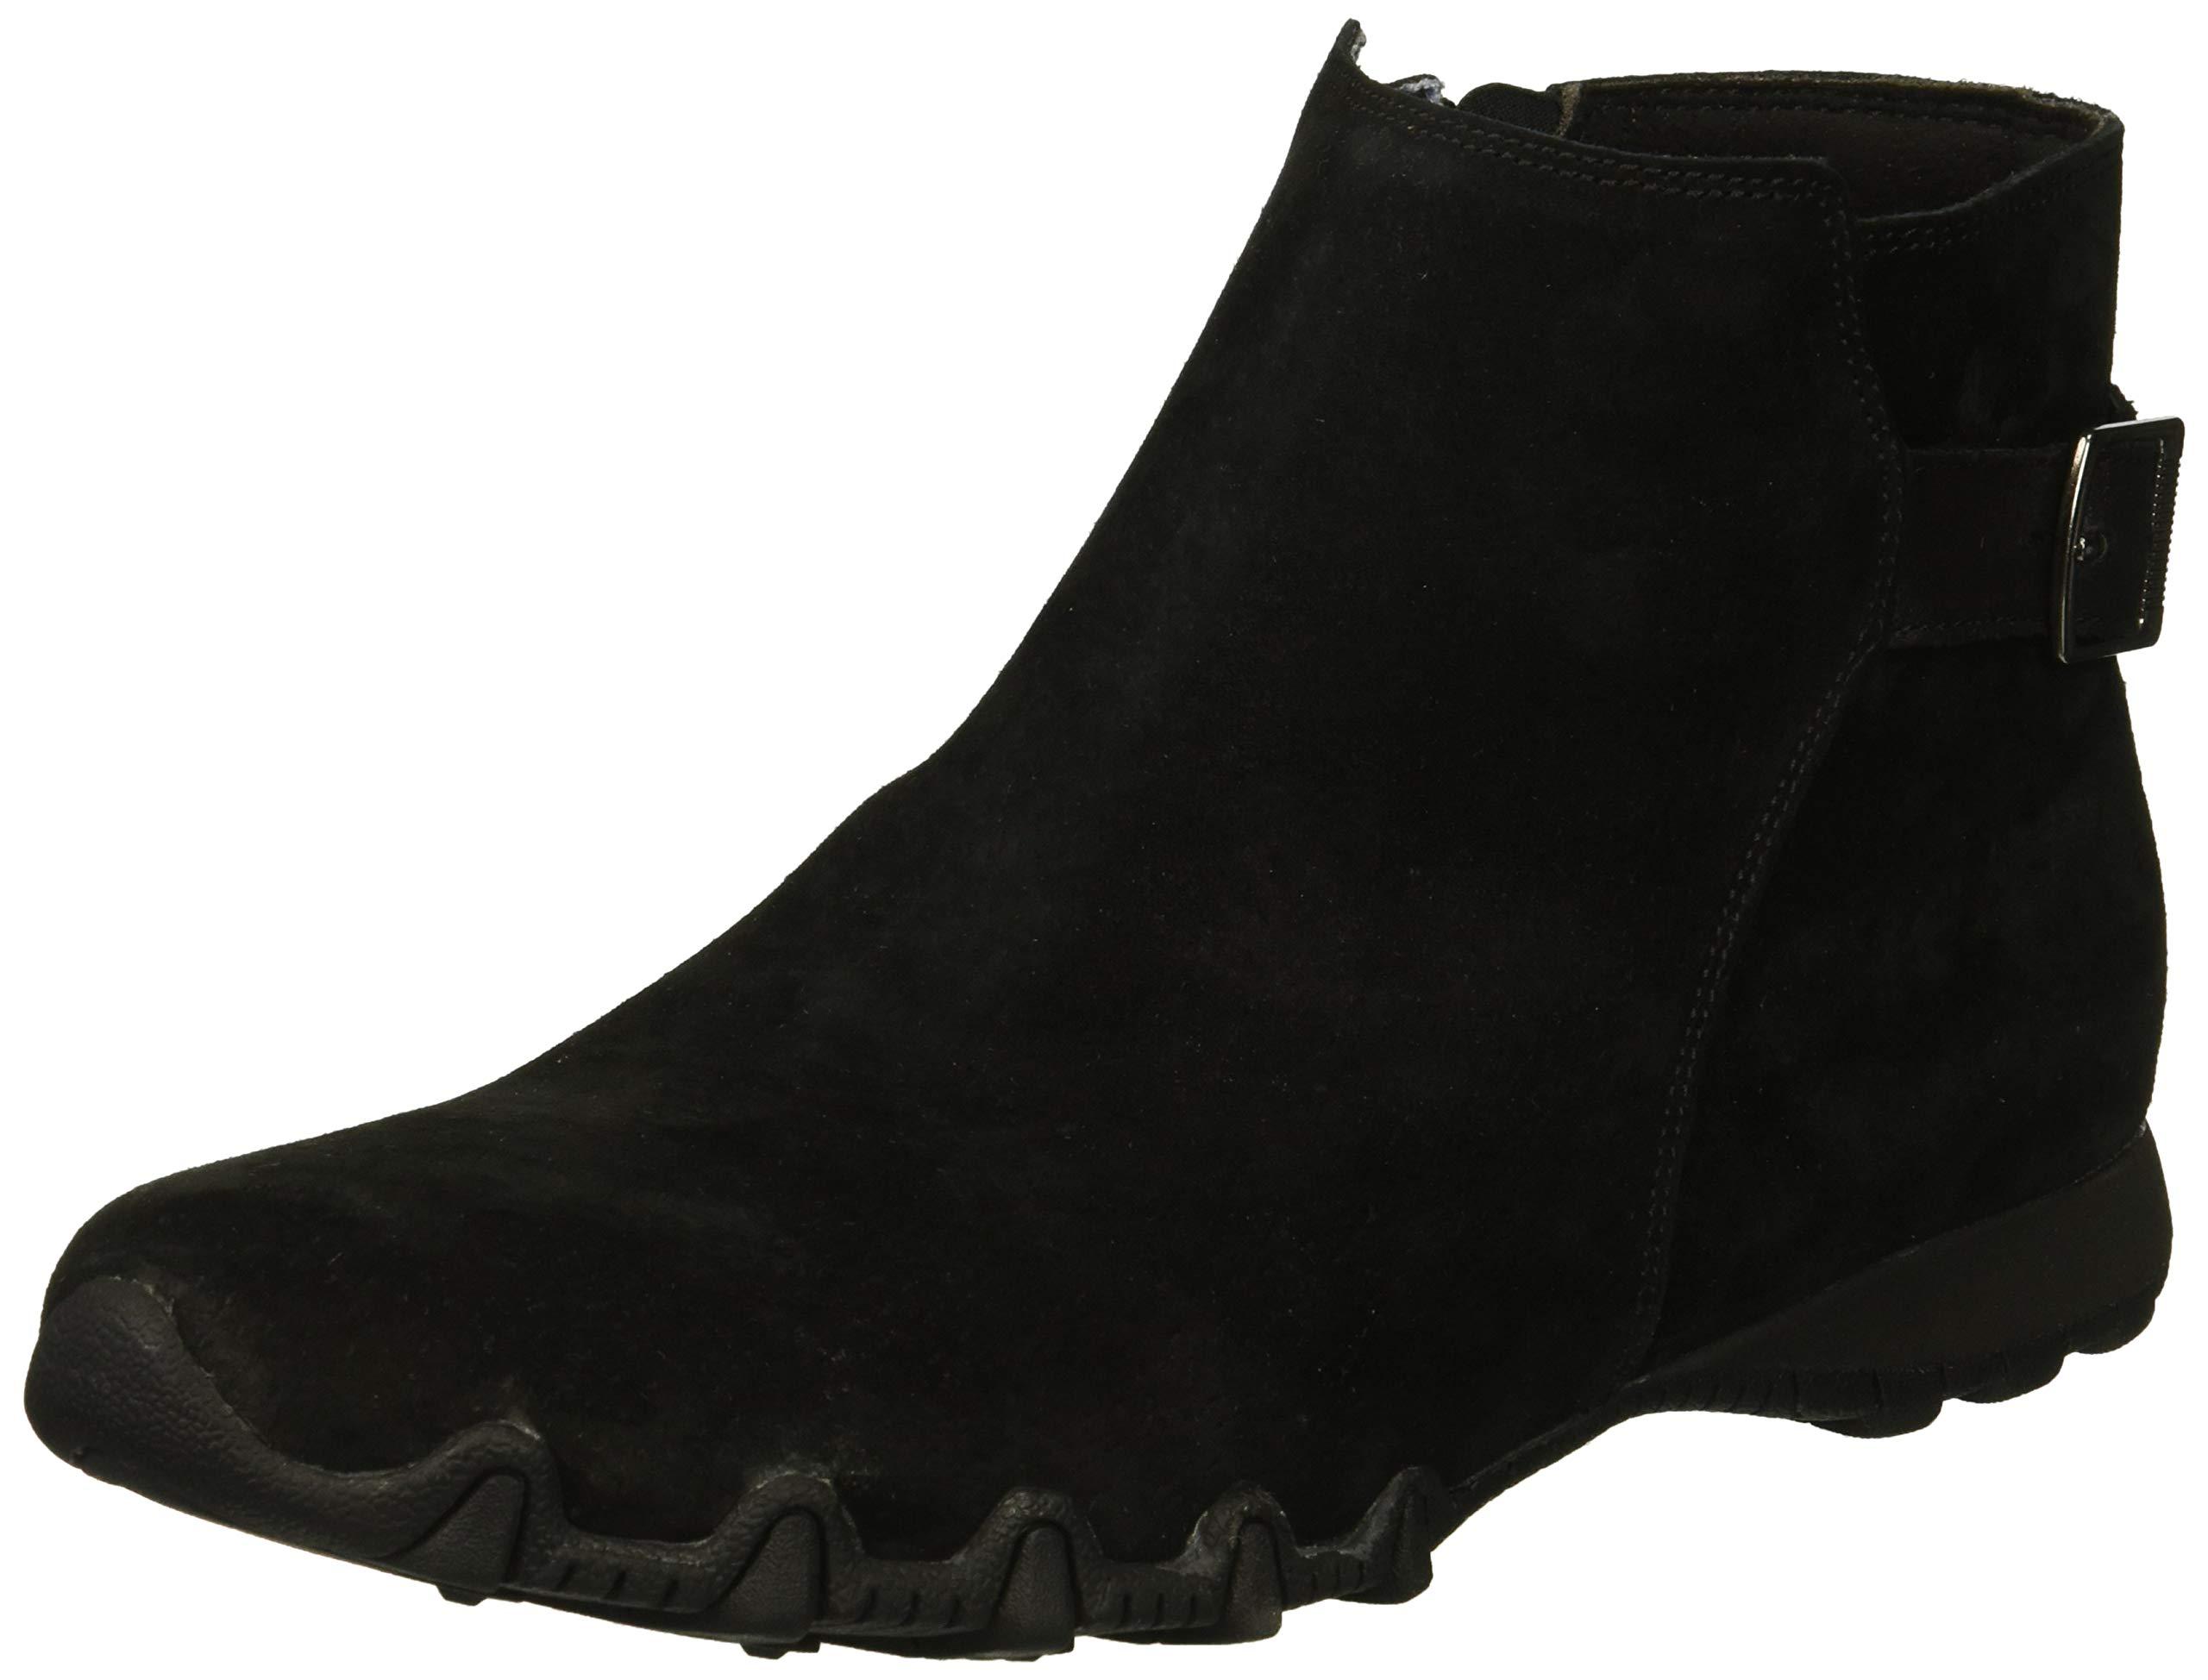 Reusable Silicone Rubber Shoe Protectors for Men Women Kids Rain Shoe Cover Non Slip Waterproof Shoe Cover 1 Pair